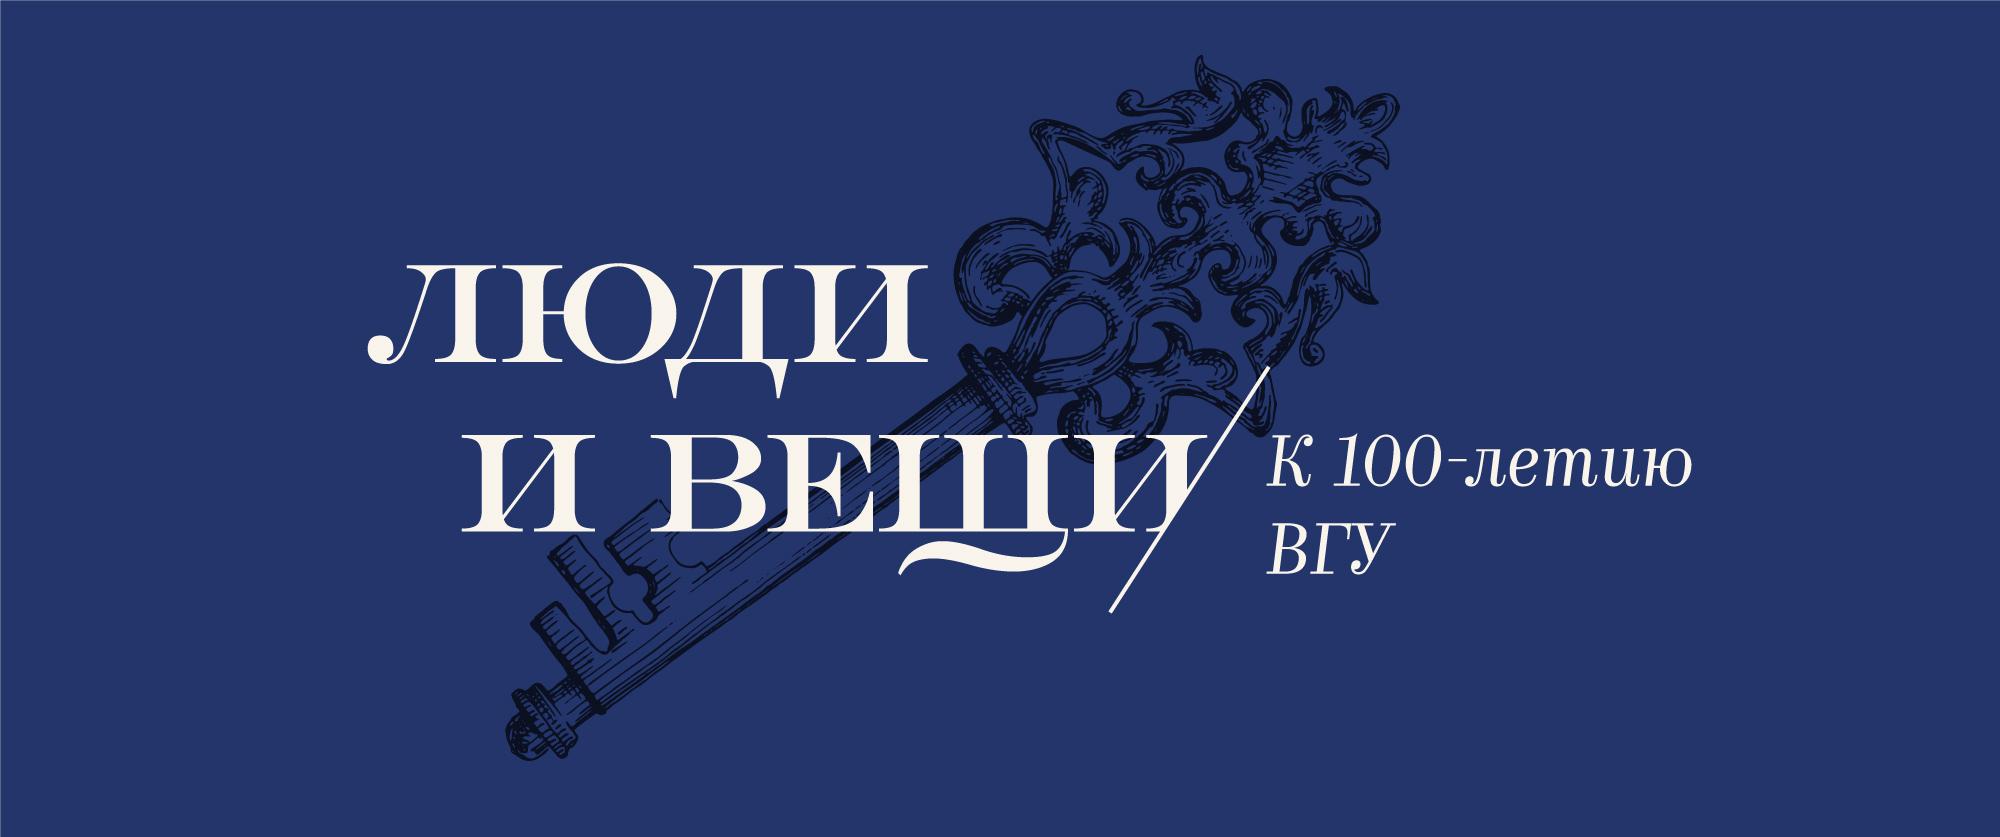 и 85-летию ВОХМ им. И.Н. Крамского